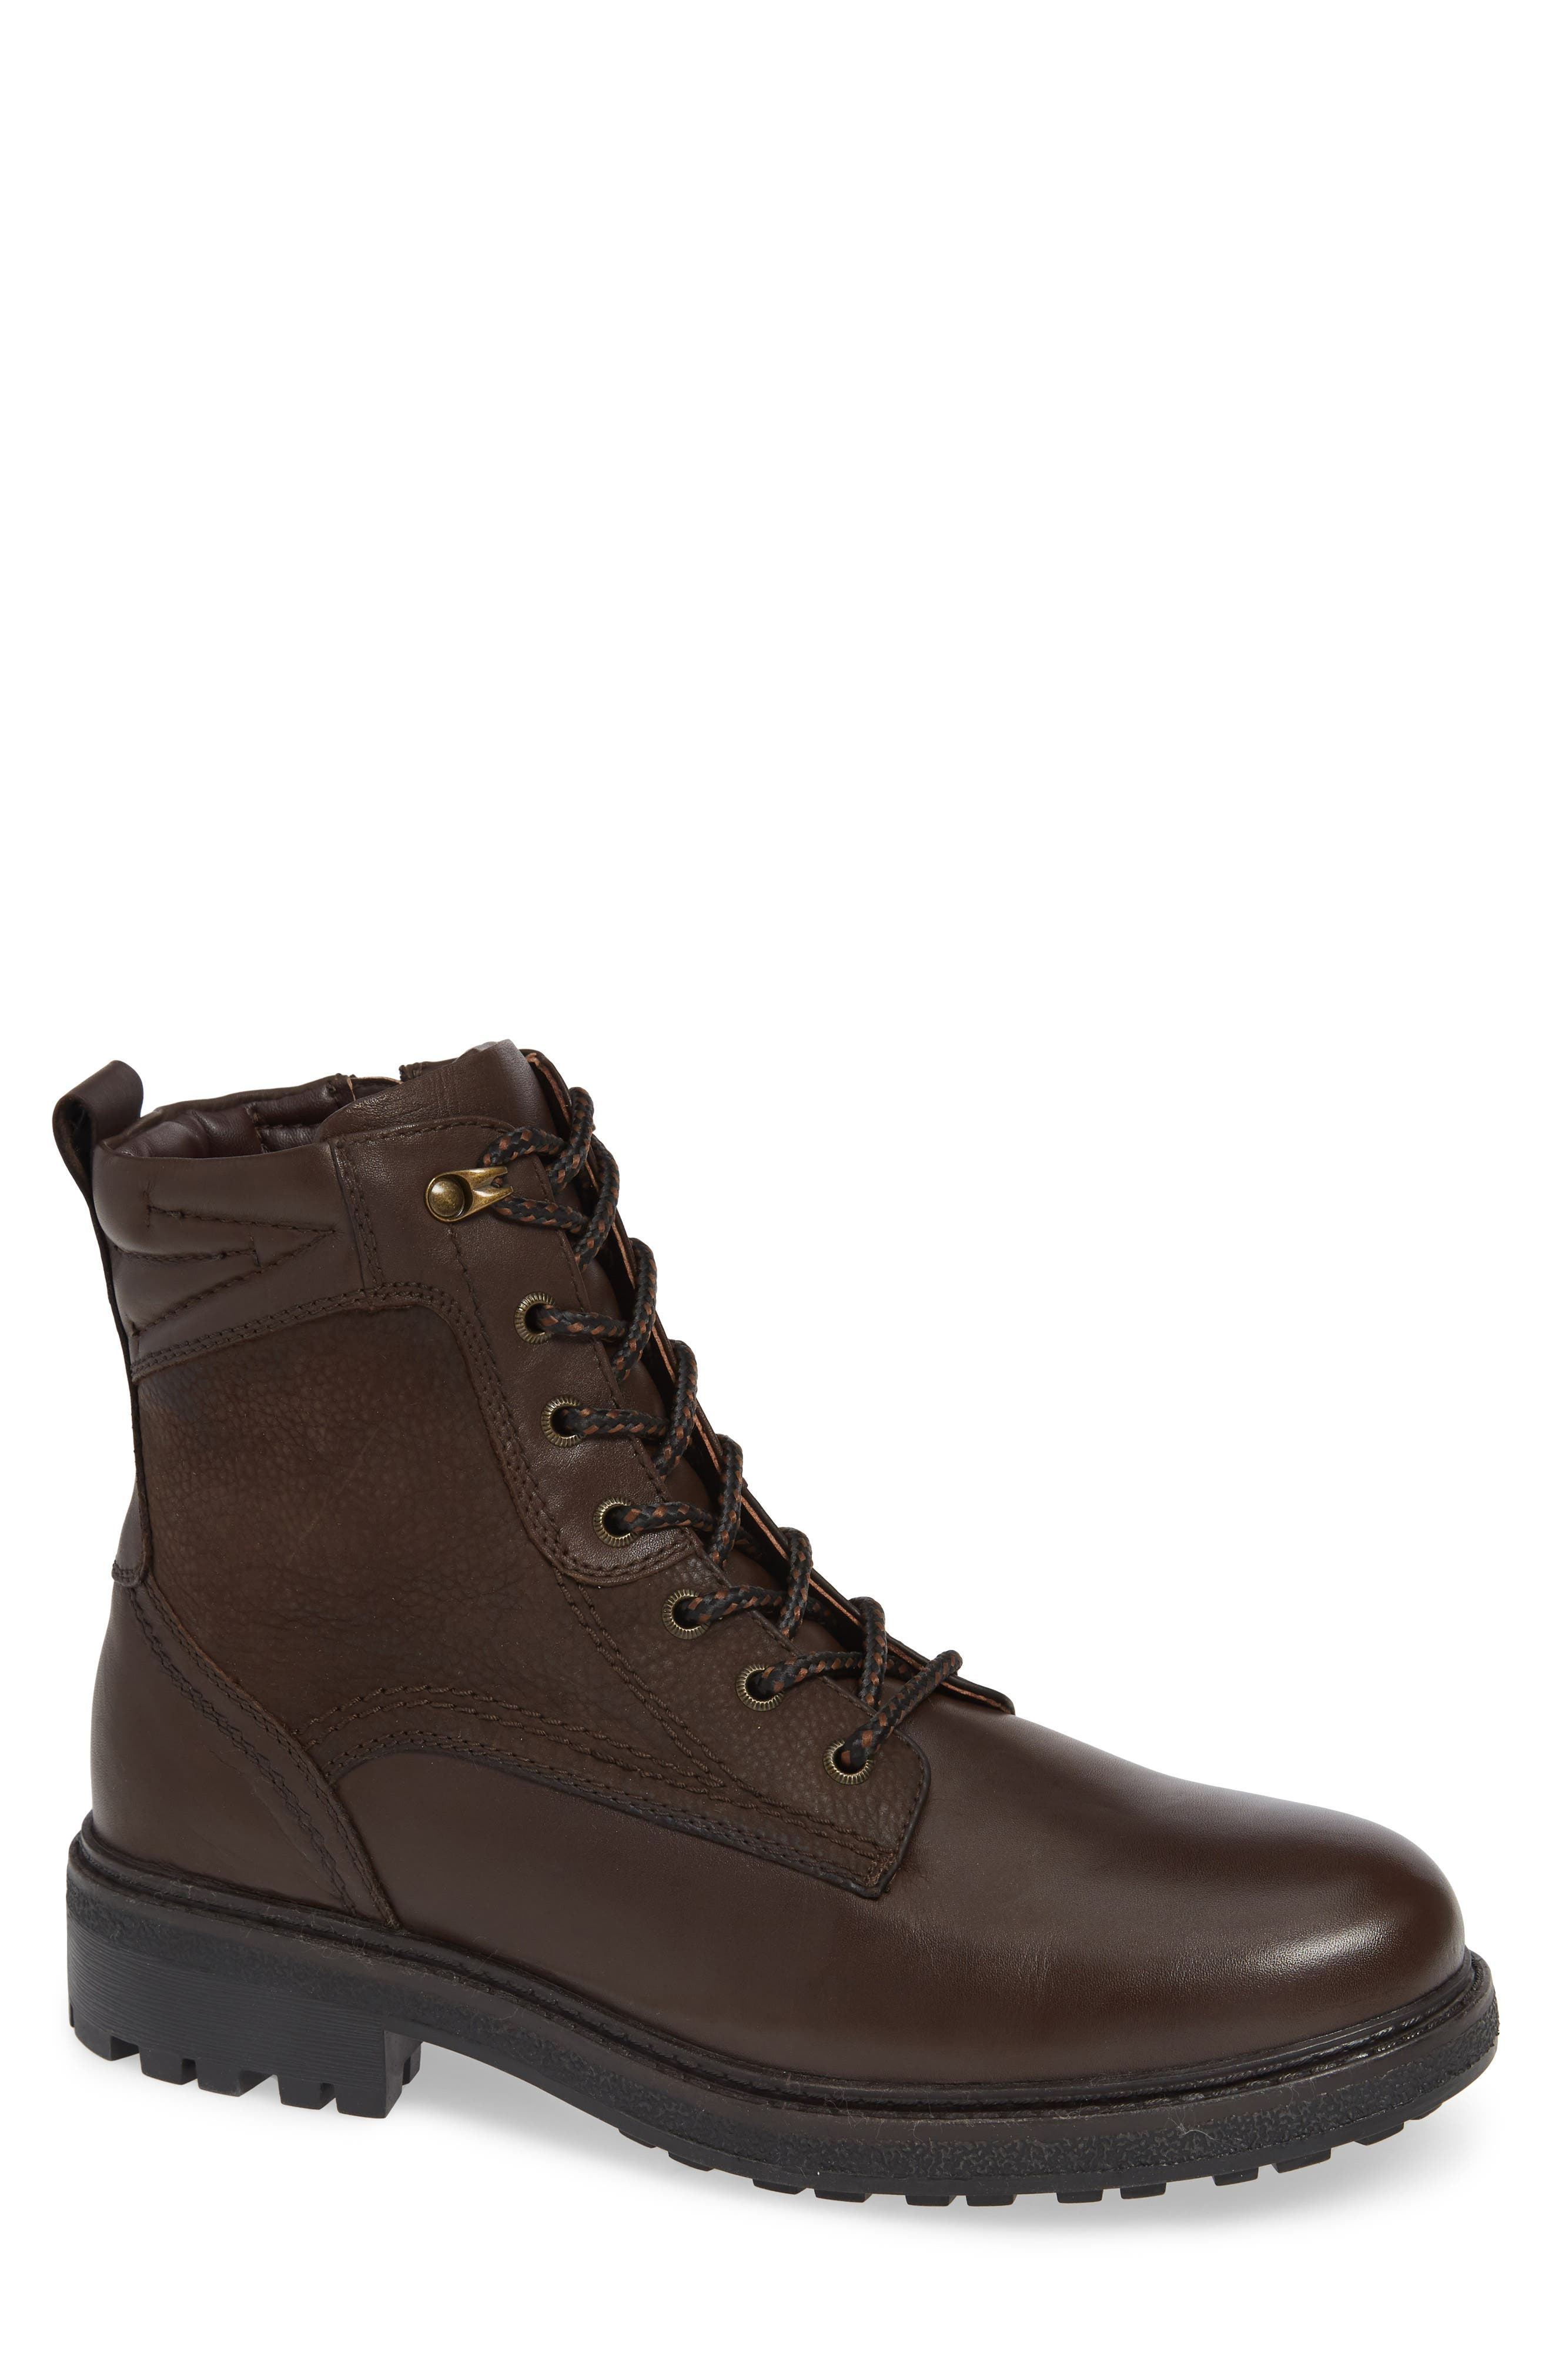 Blondo Jasper Waterproof Plain Toe Boot- Black